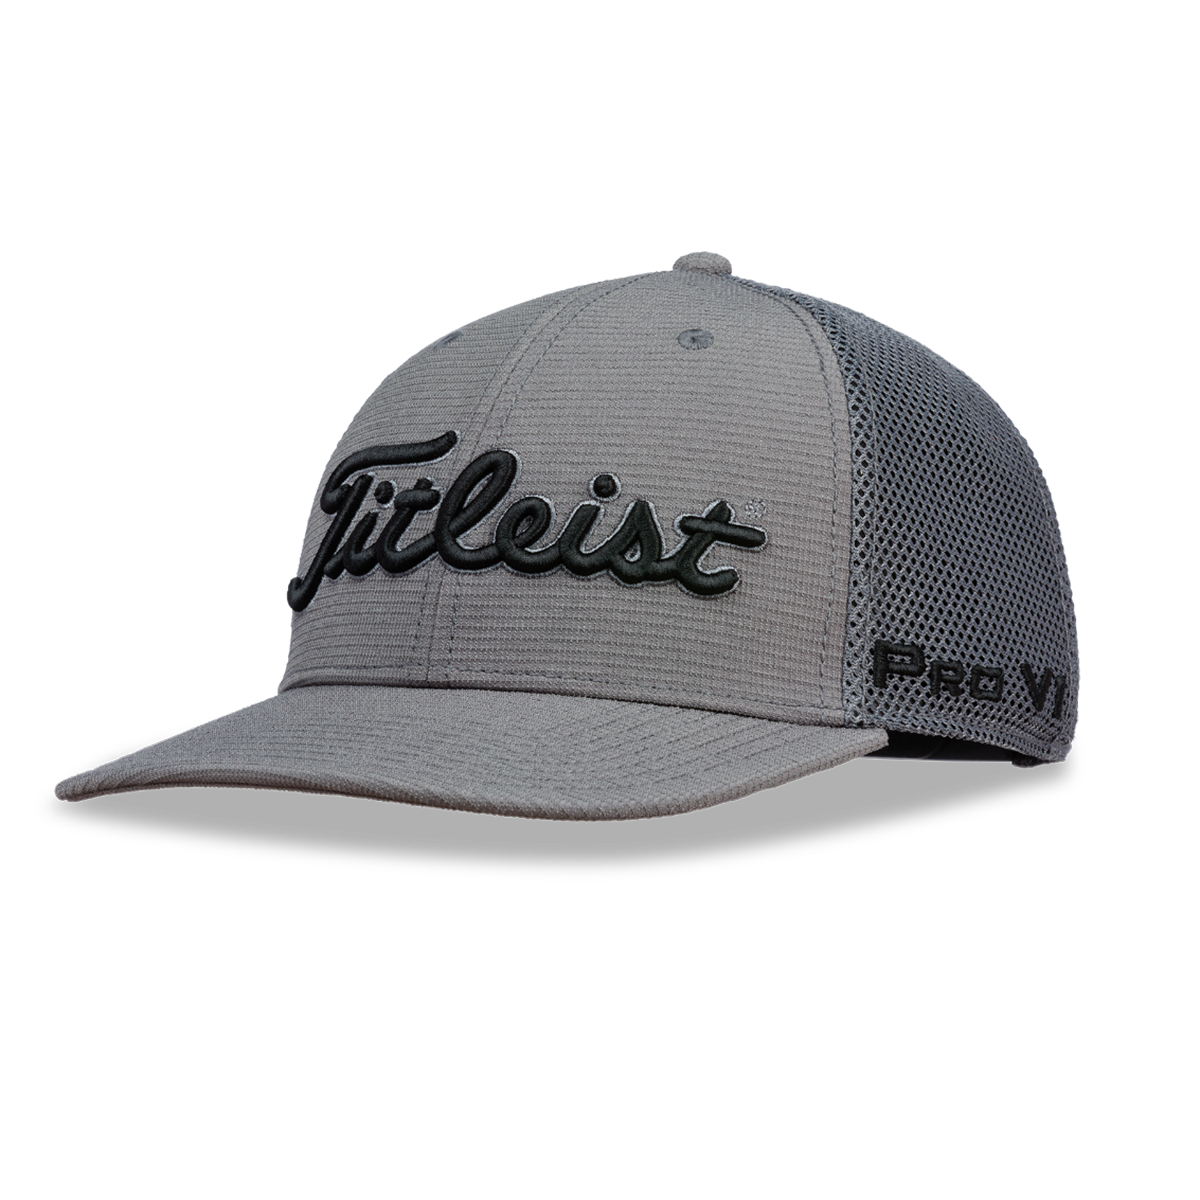 f69fa8af9c99a Titleist Tour Snapback Mesh Hat